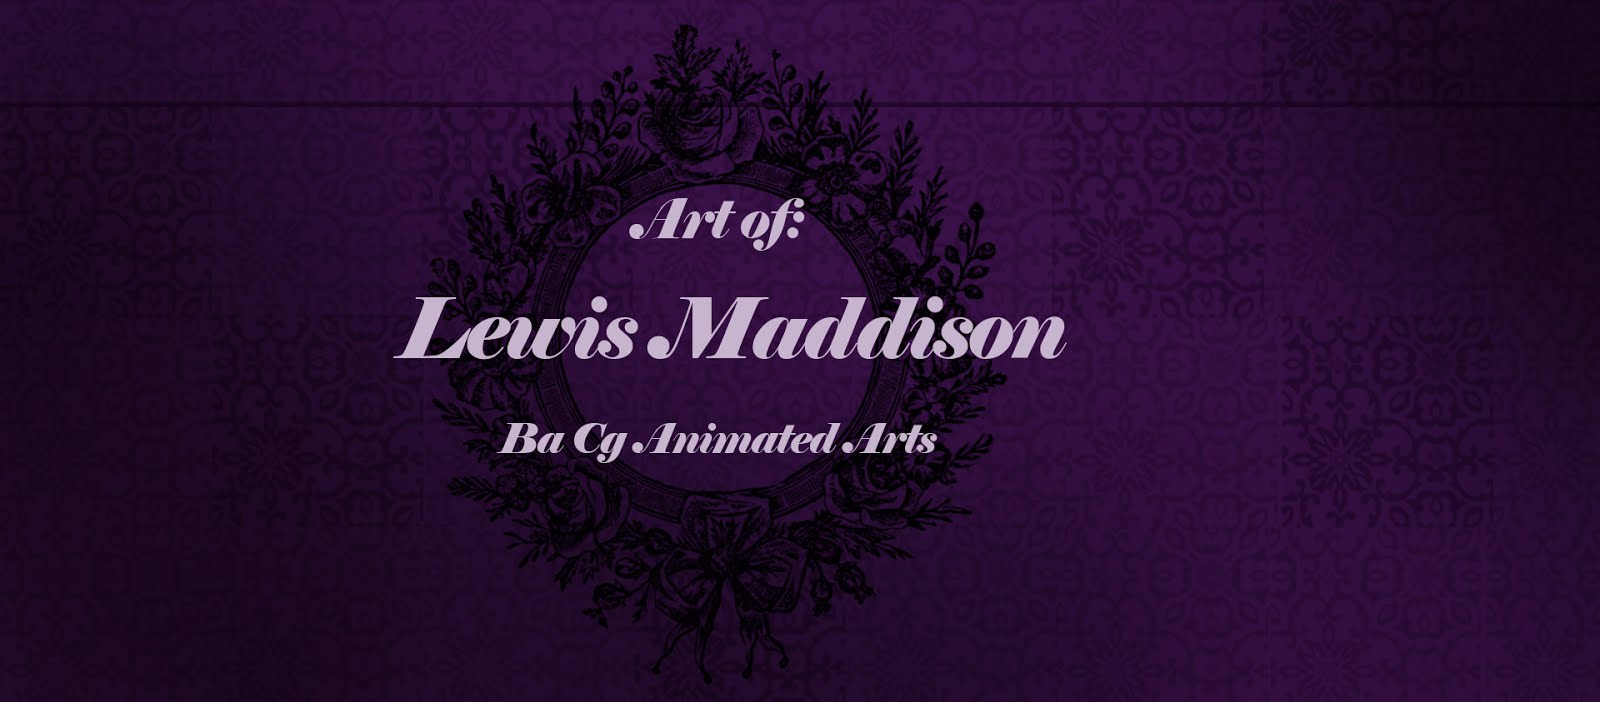 Lewis Maddison- BA (Hons) Computer Animation Arts